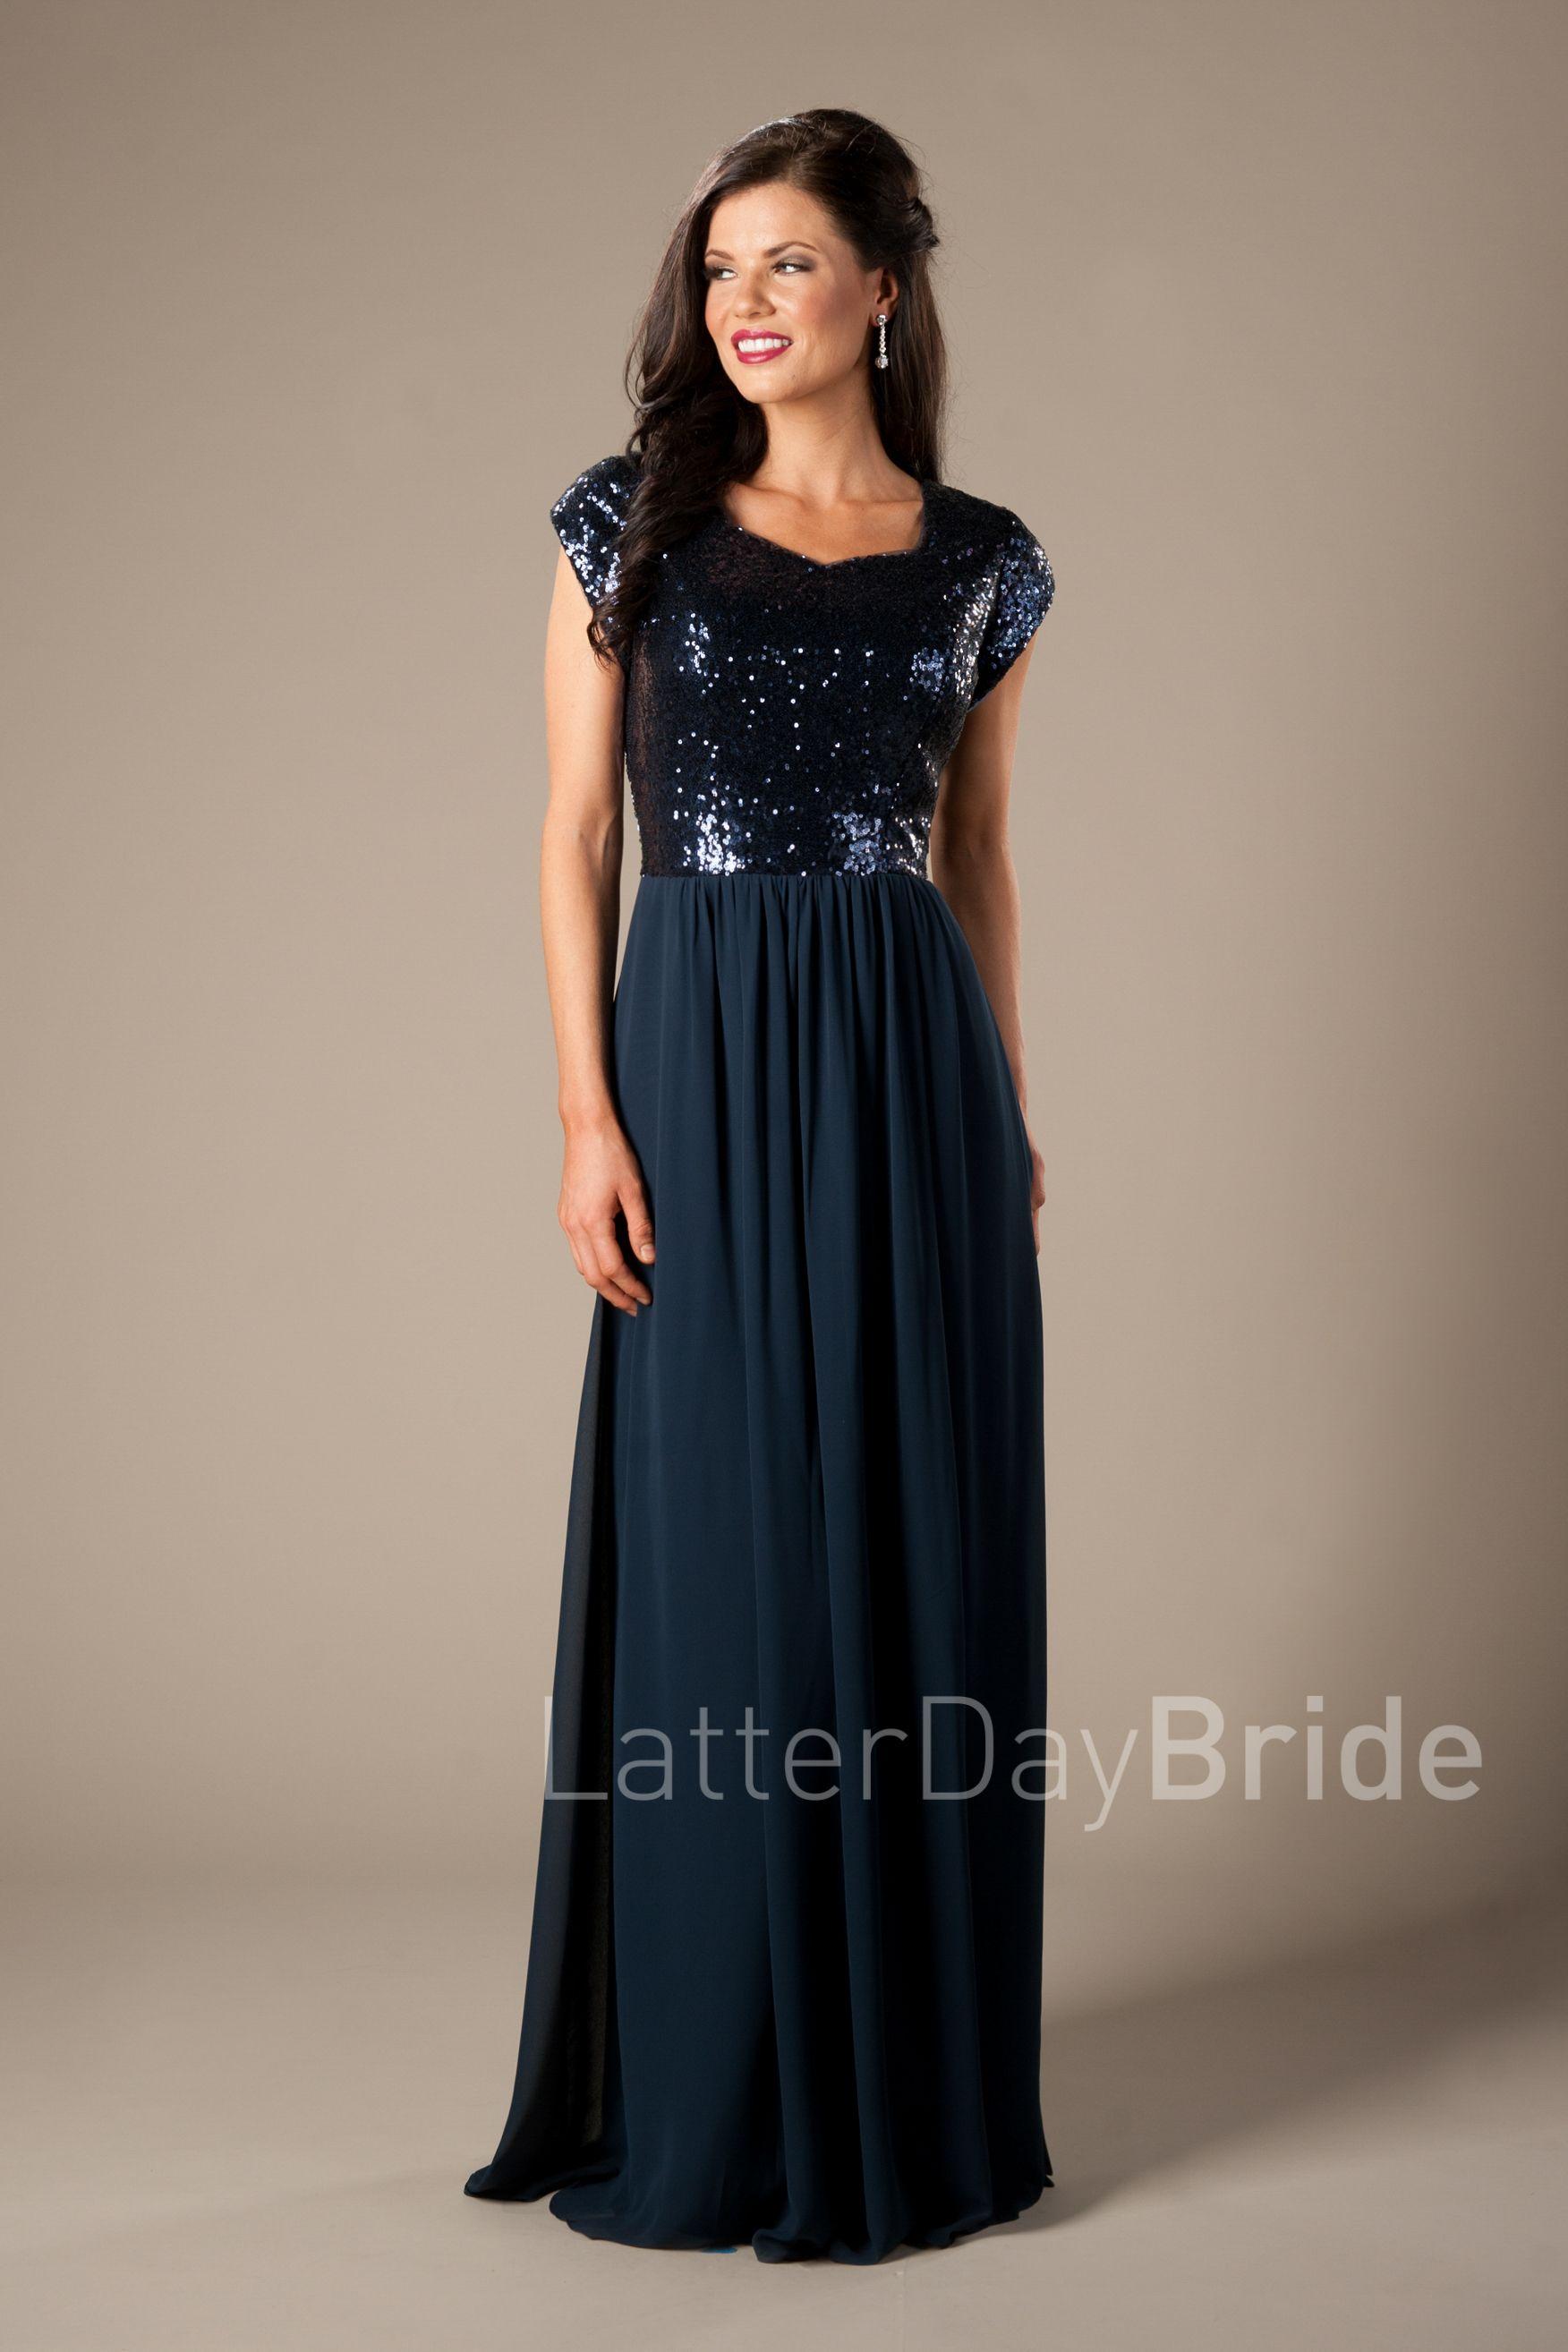 cbebc312096 Dark Navy Blue Long Chiffon Modest Bridesmaid Dresses For Wedding Cap Short  Sleeves A Line Floor Length Beach Temple Maids Of Honor Dresses Stylish ...